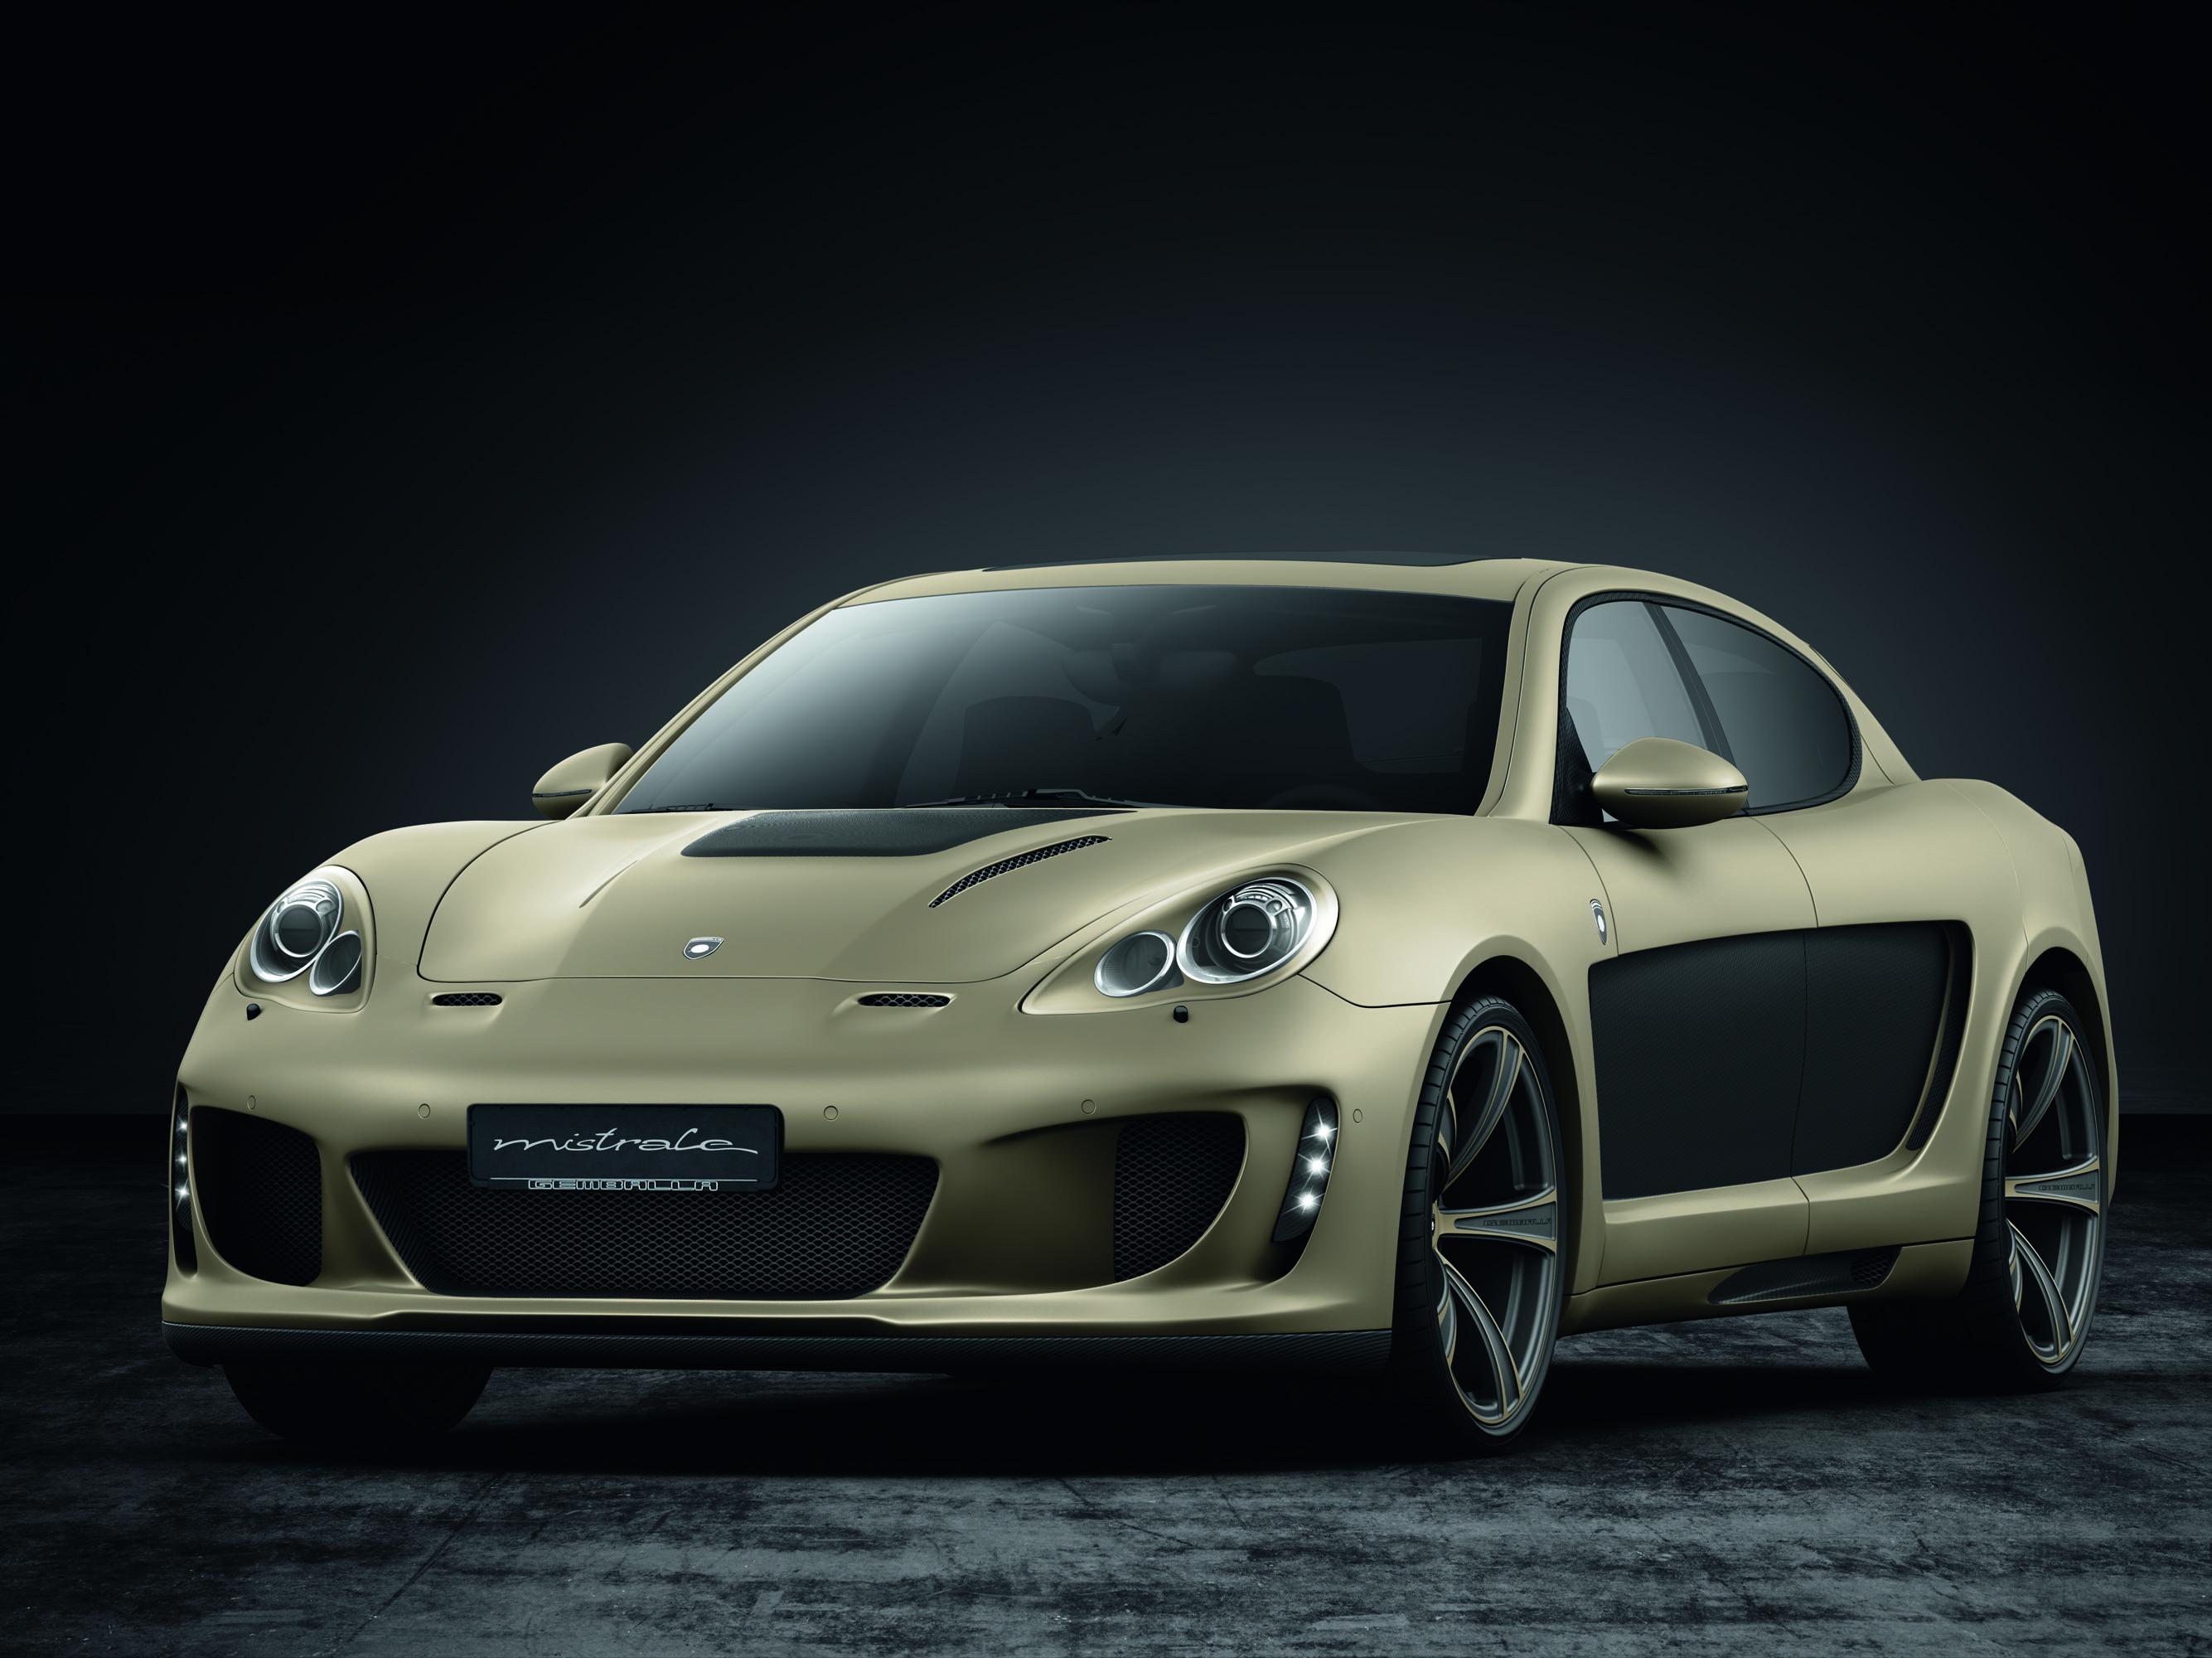 Gemballa Porsche Panamera Mistrale photo #1